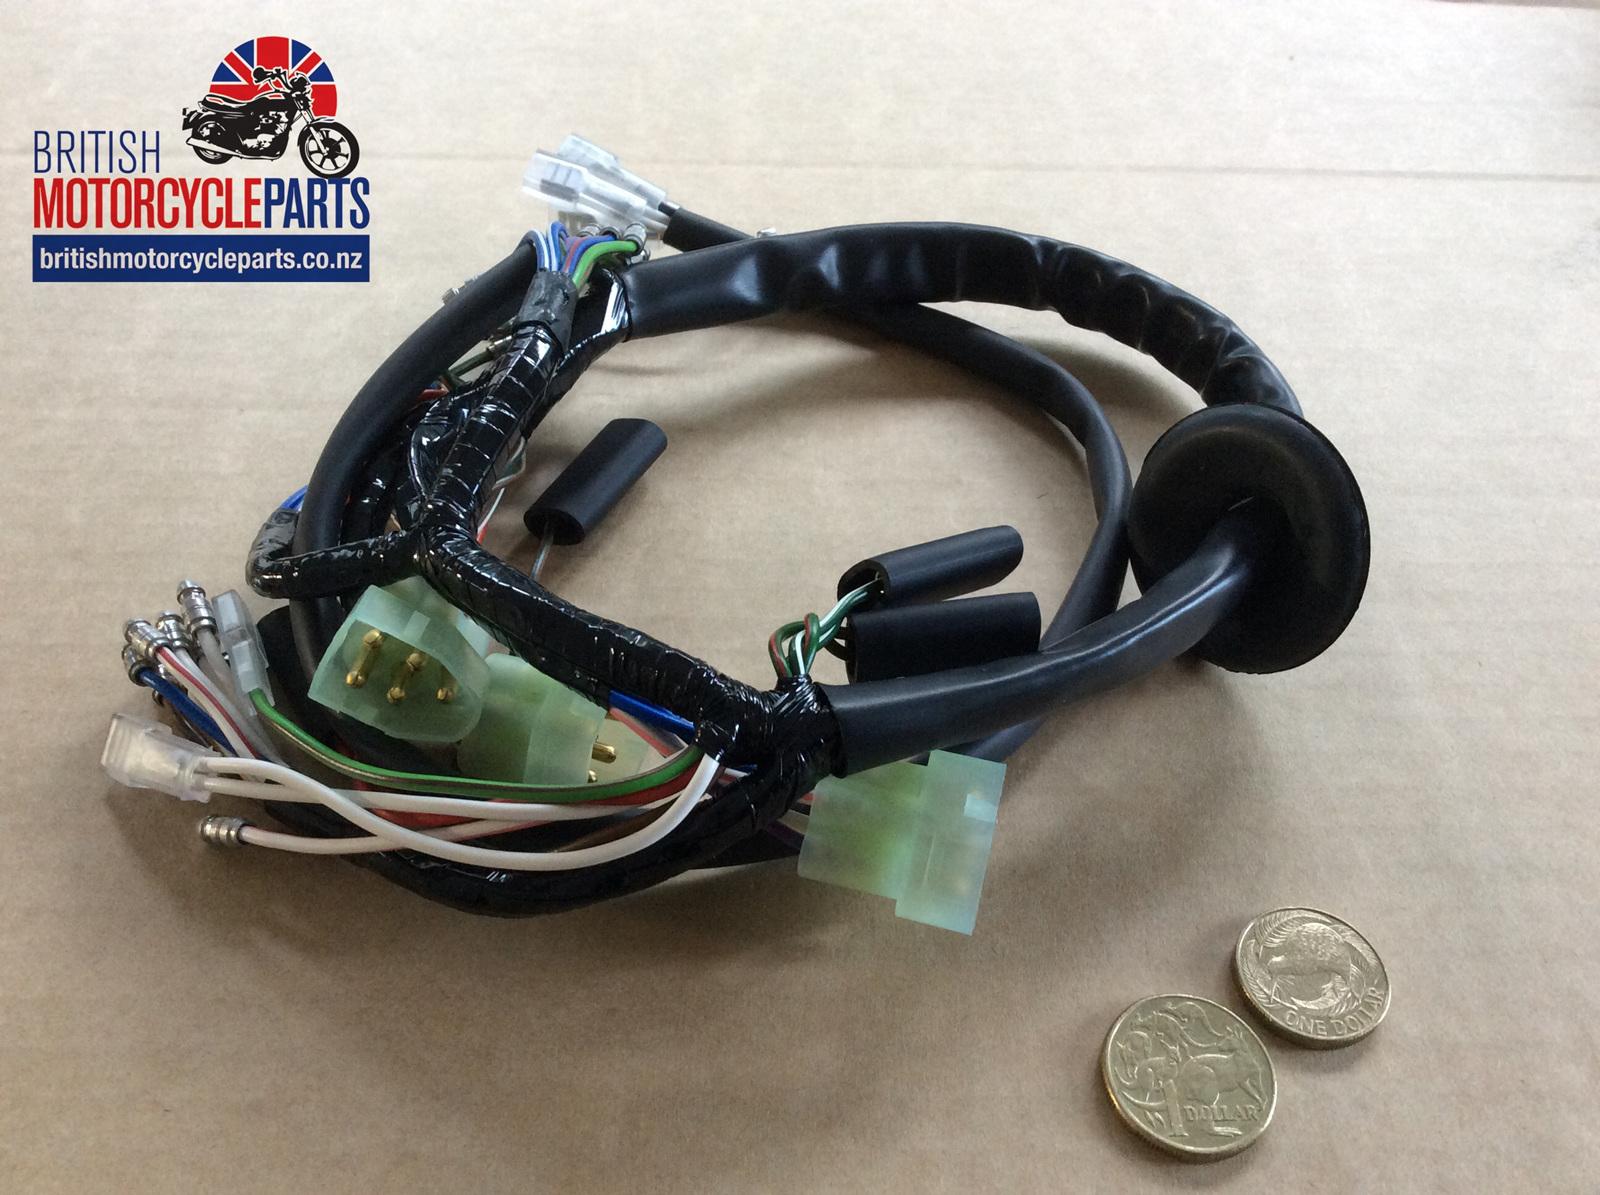 06 6438 Headlight Wiring Loom Mk3 Commando 1975 British Motorcycle Looms